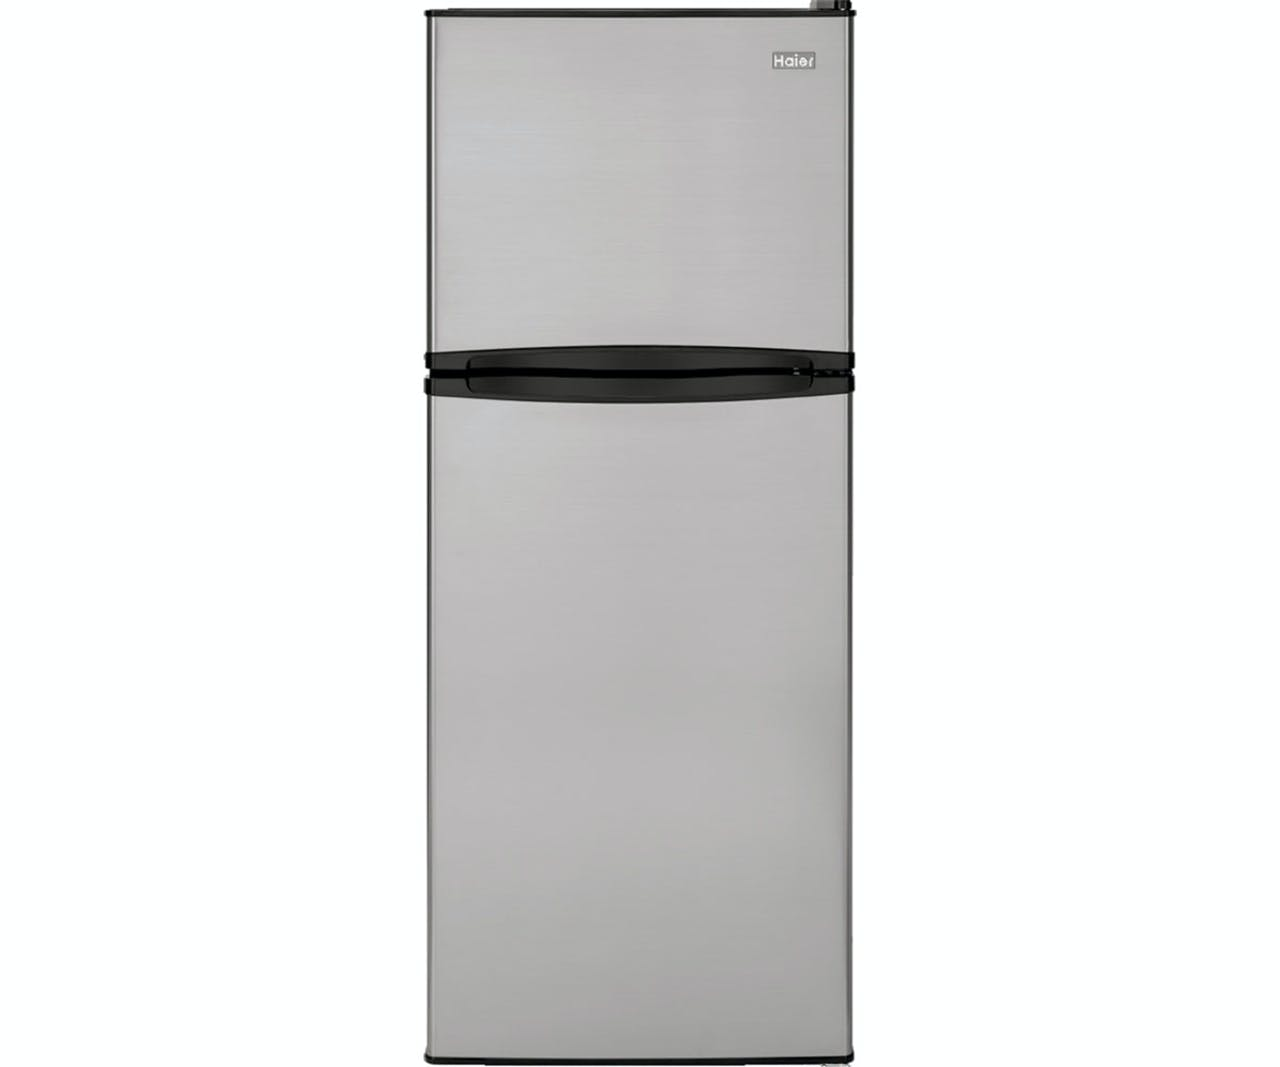 Haier Top Freezer Refrigerators